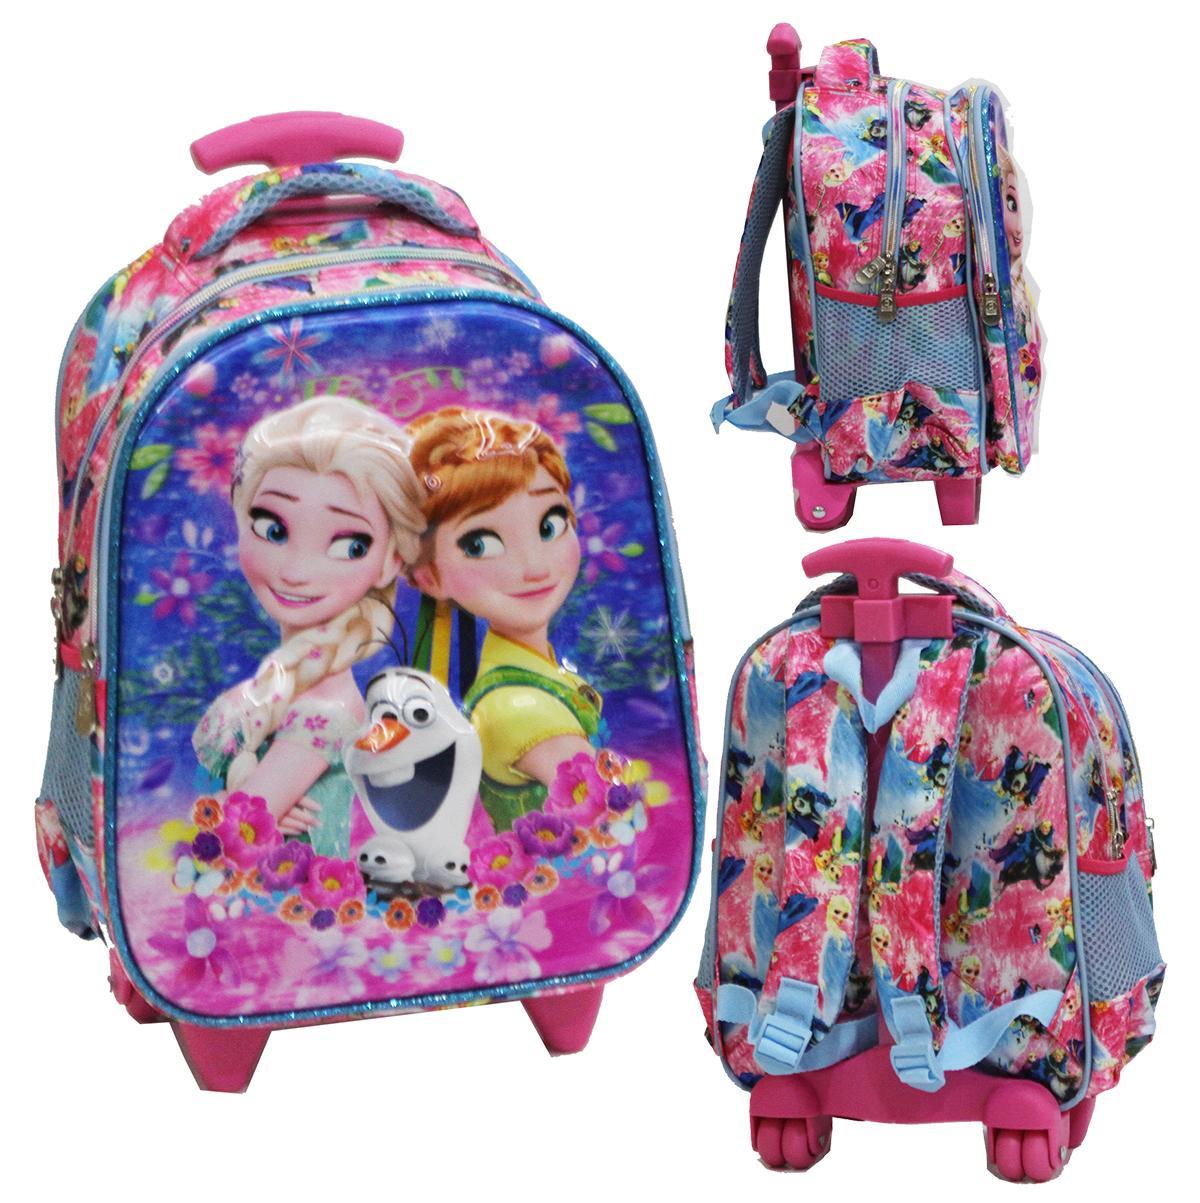 Onlan Tas Trolley Anak Sekolah TK Karakter Anak Perempuan Frozen 5D Timbul Import